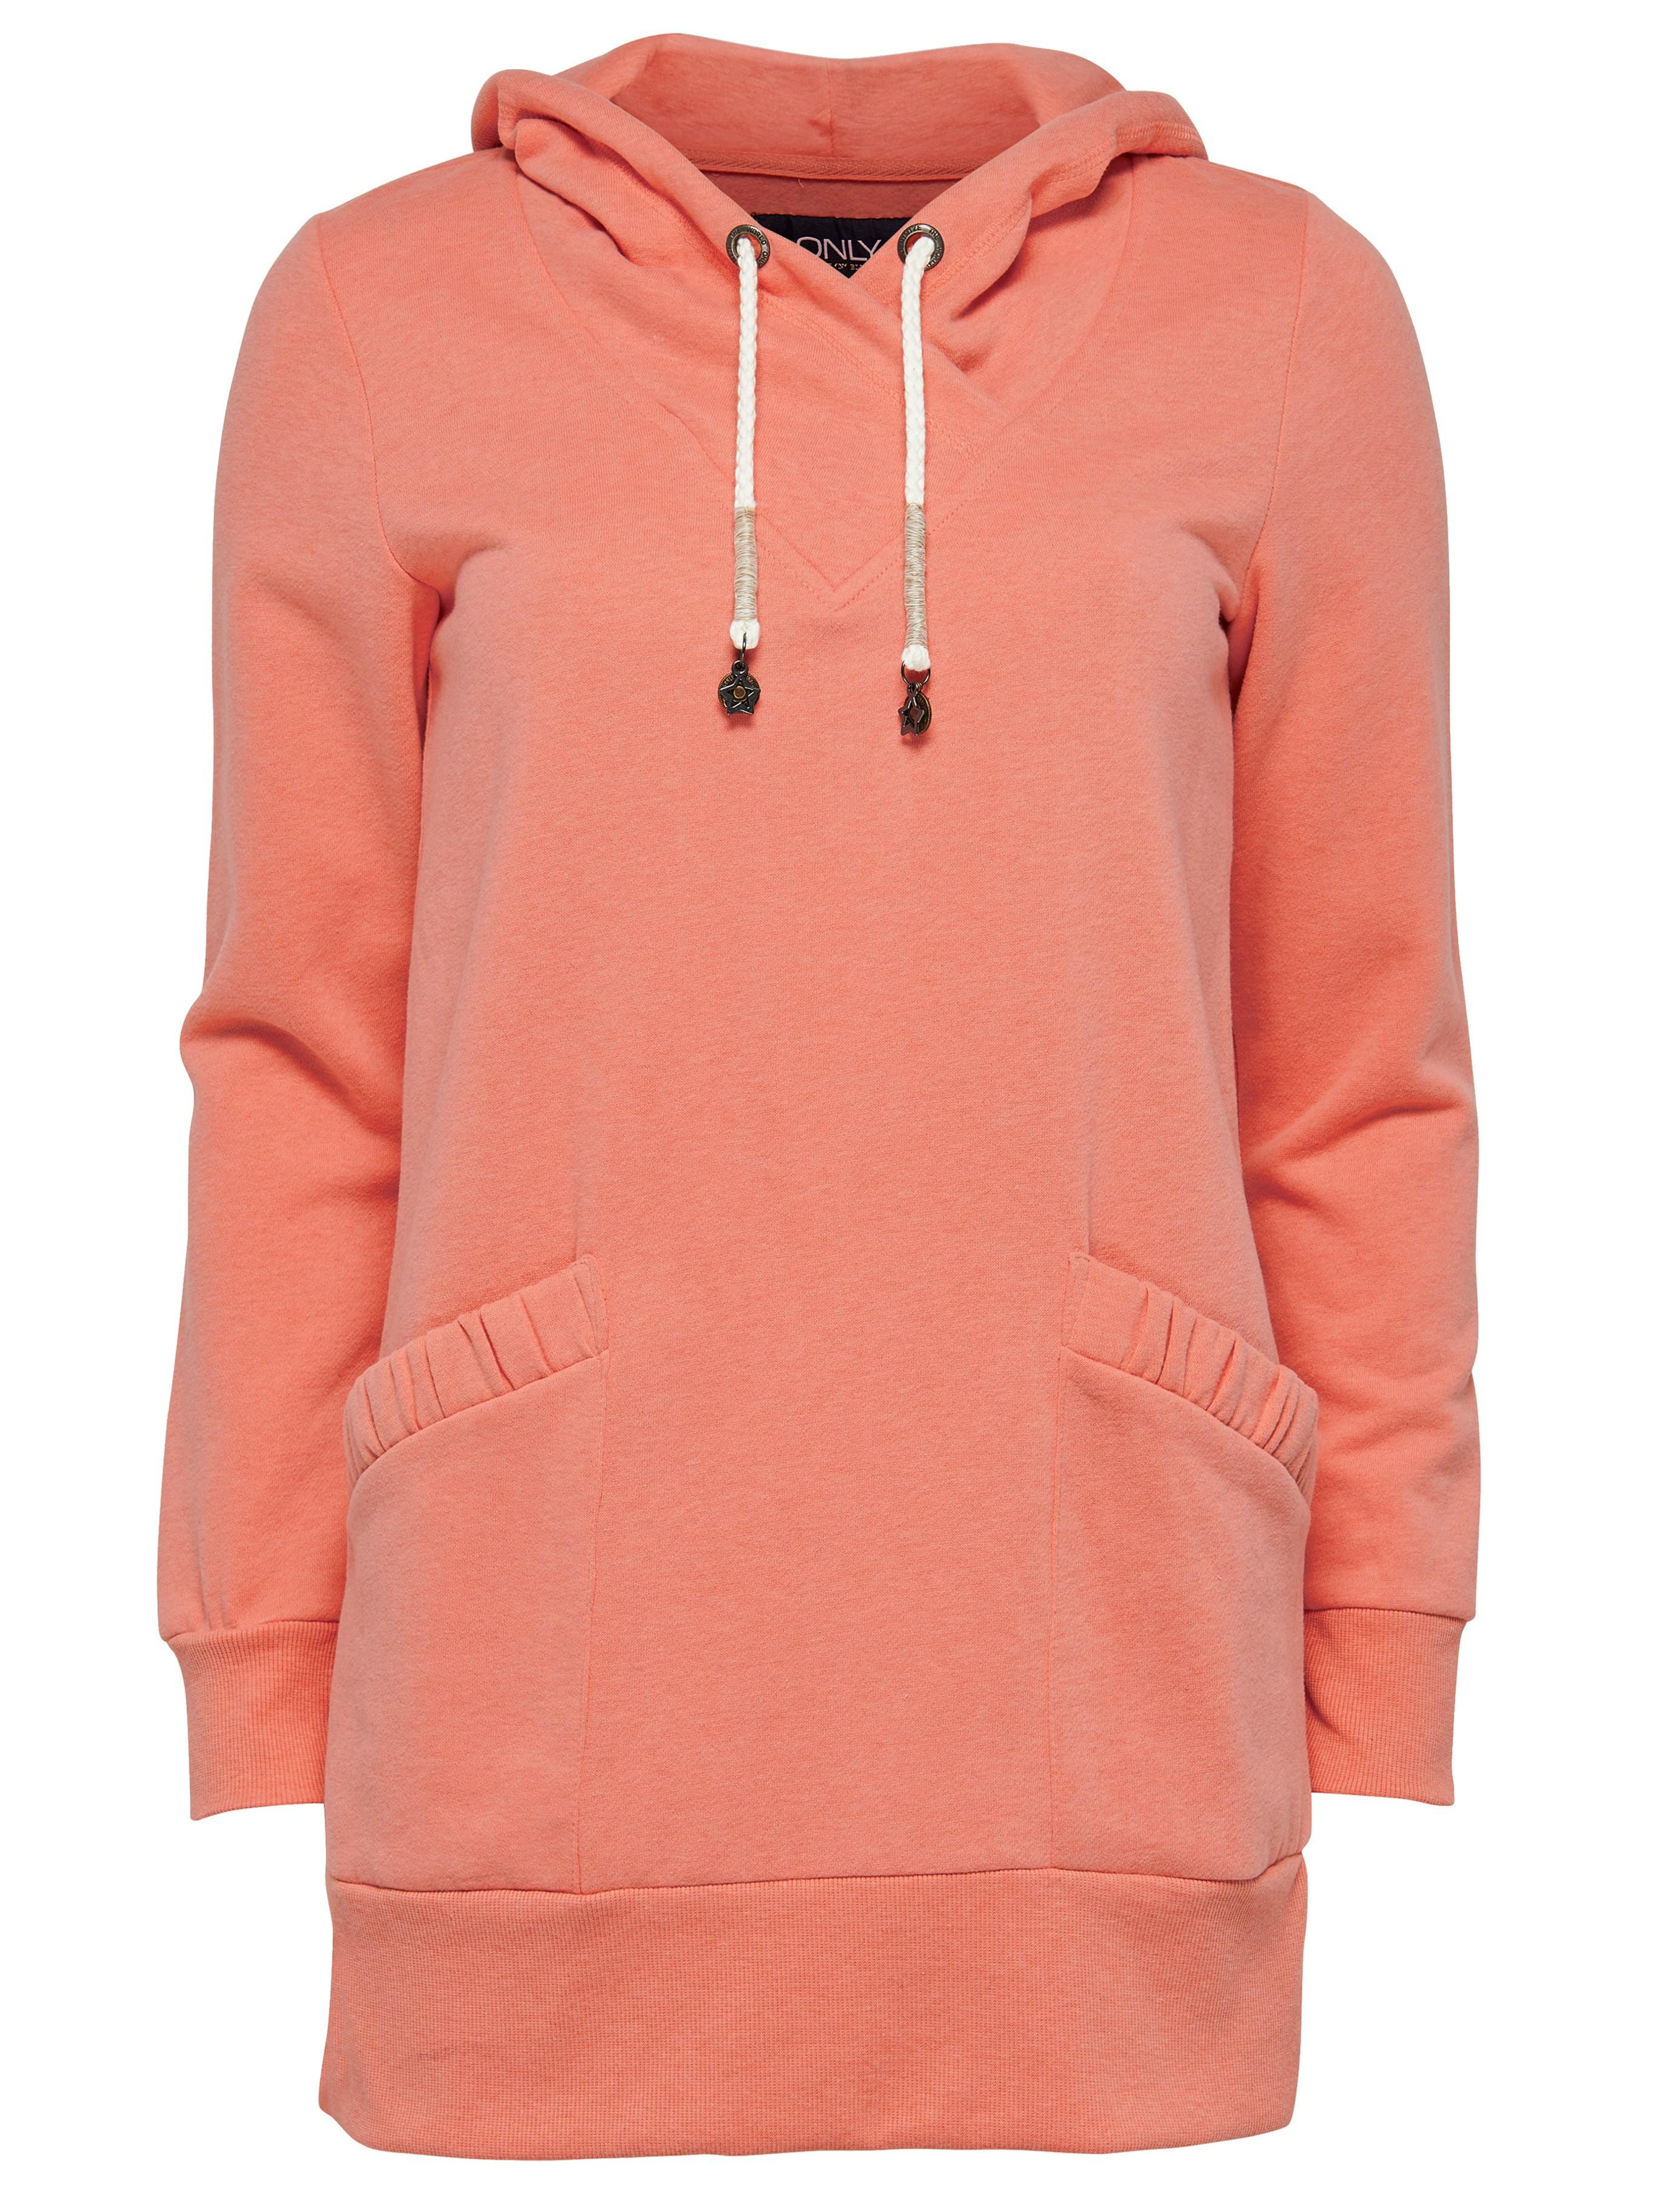 only damen sweatshirt sweat pullover onlnora l s hood long swt blau orange rosa marken only. Black Bedroom Furniture Sets. Home Design Ideas